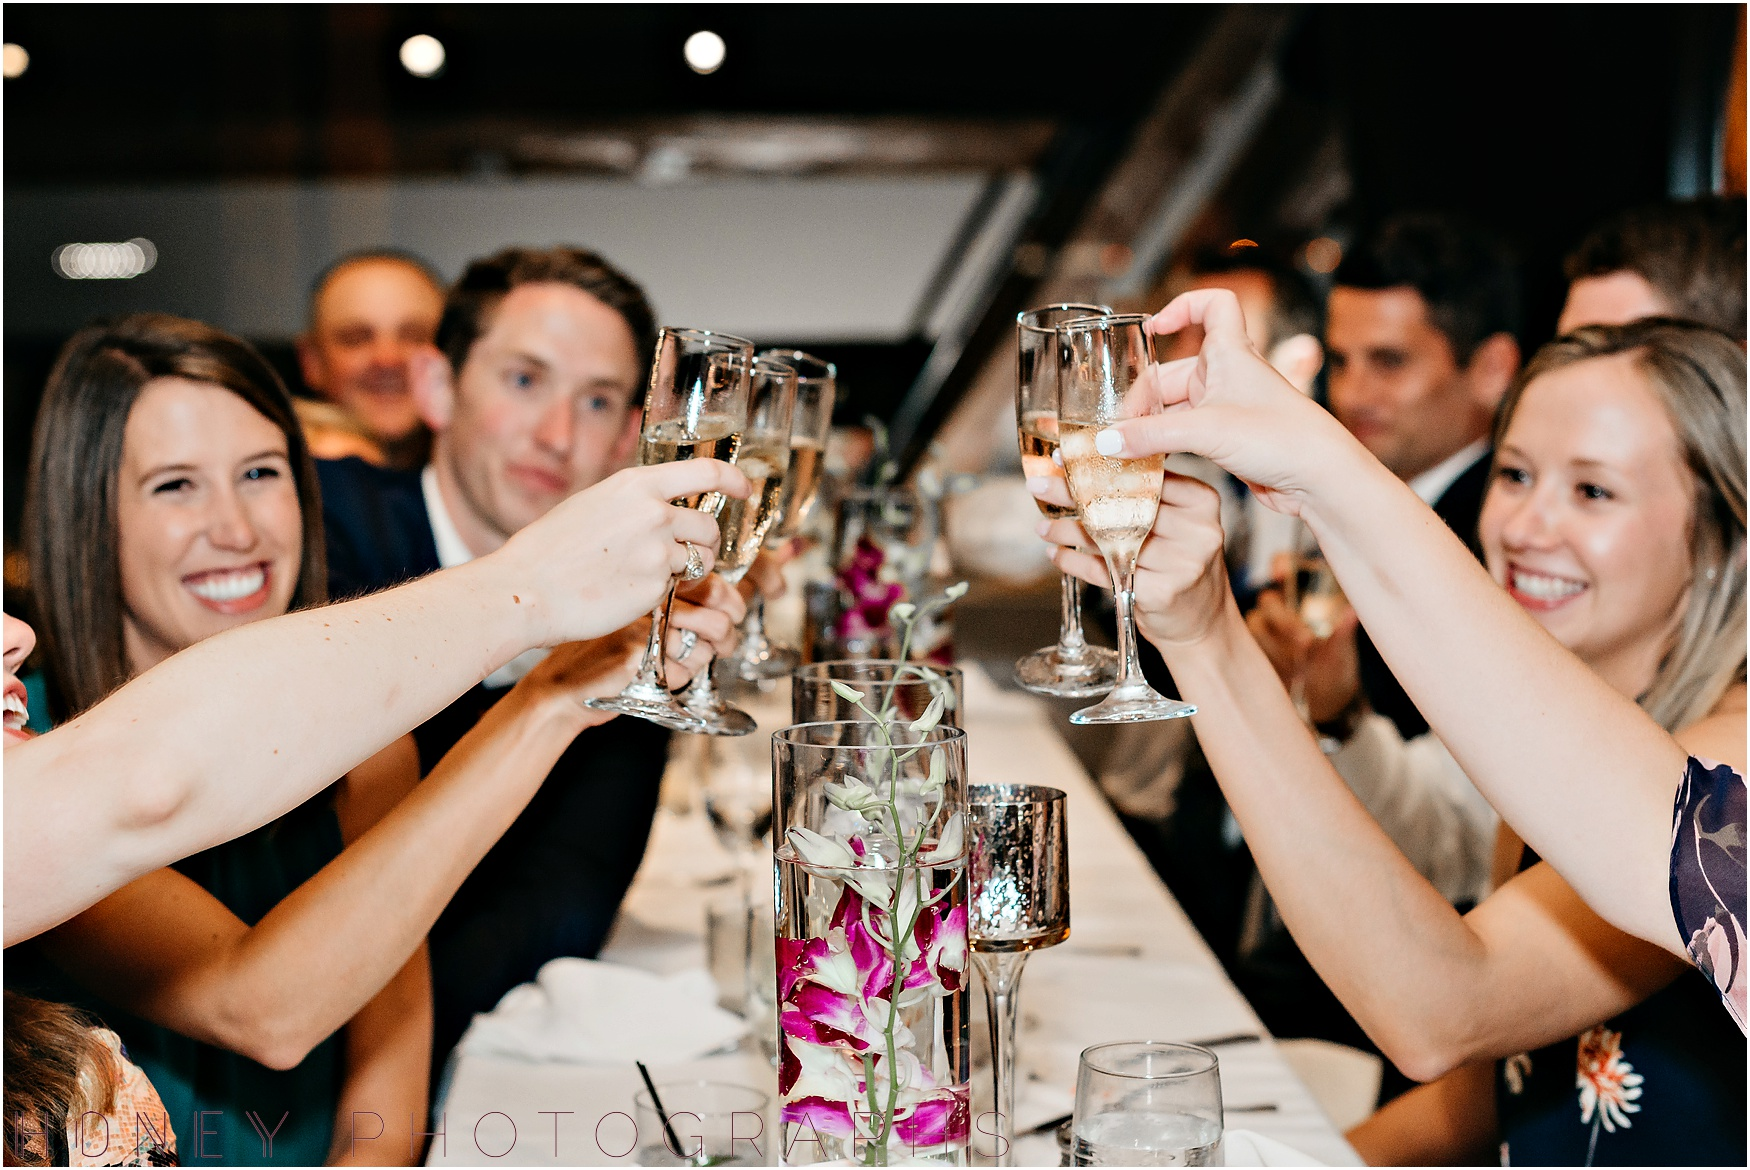 bali-hai-tropical-bubble-exit-party-paradise-wedding061.jpg